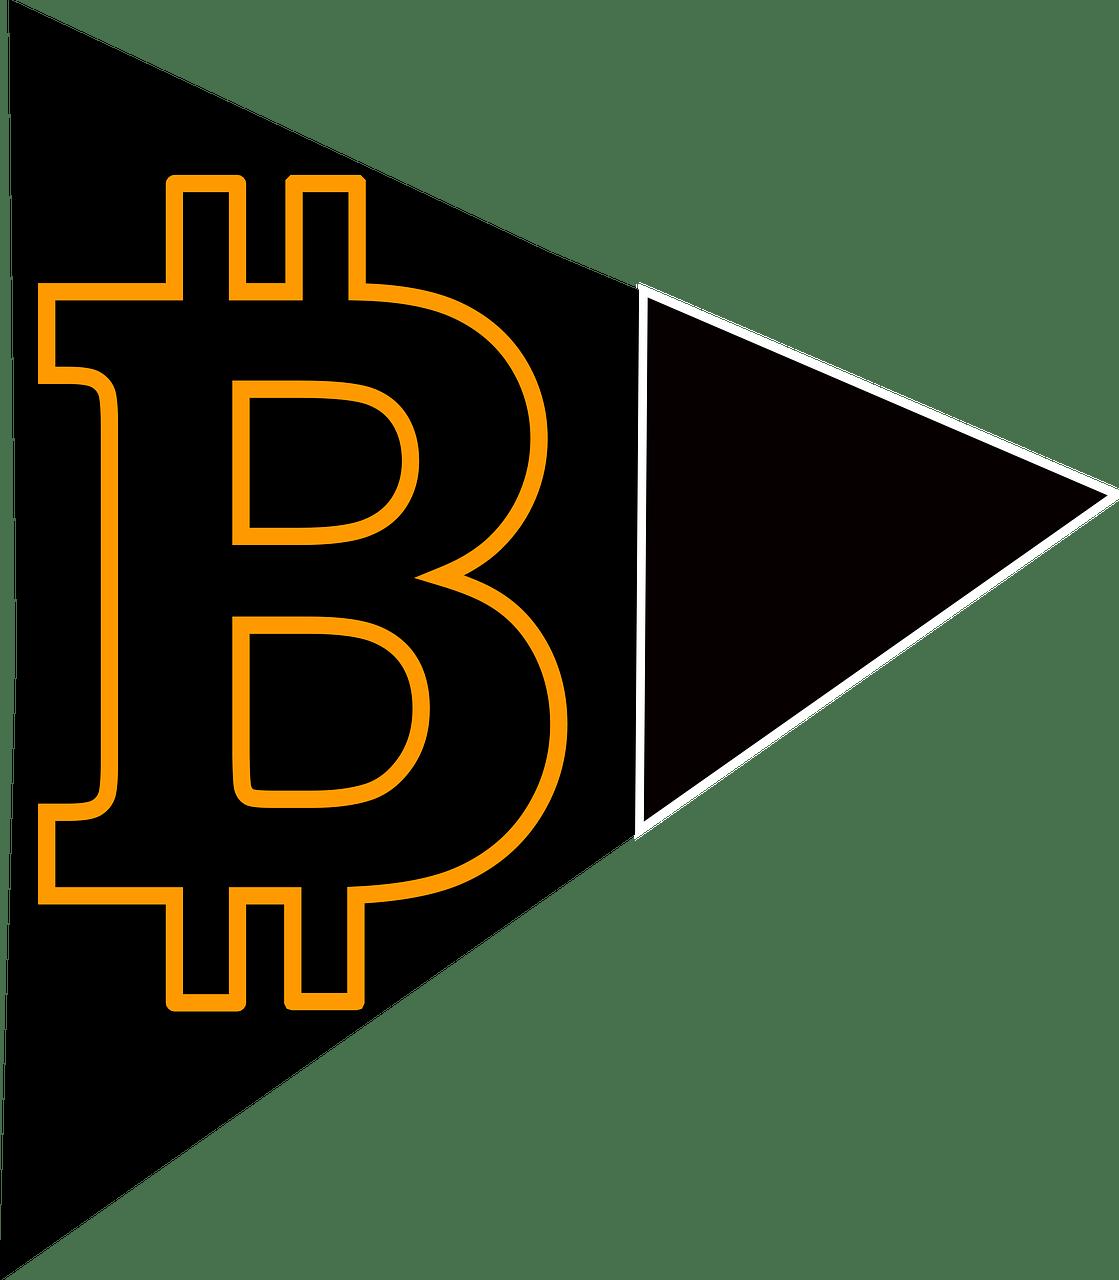 bit-coin-721805_1280